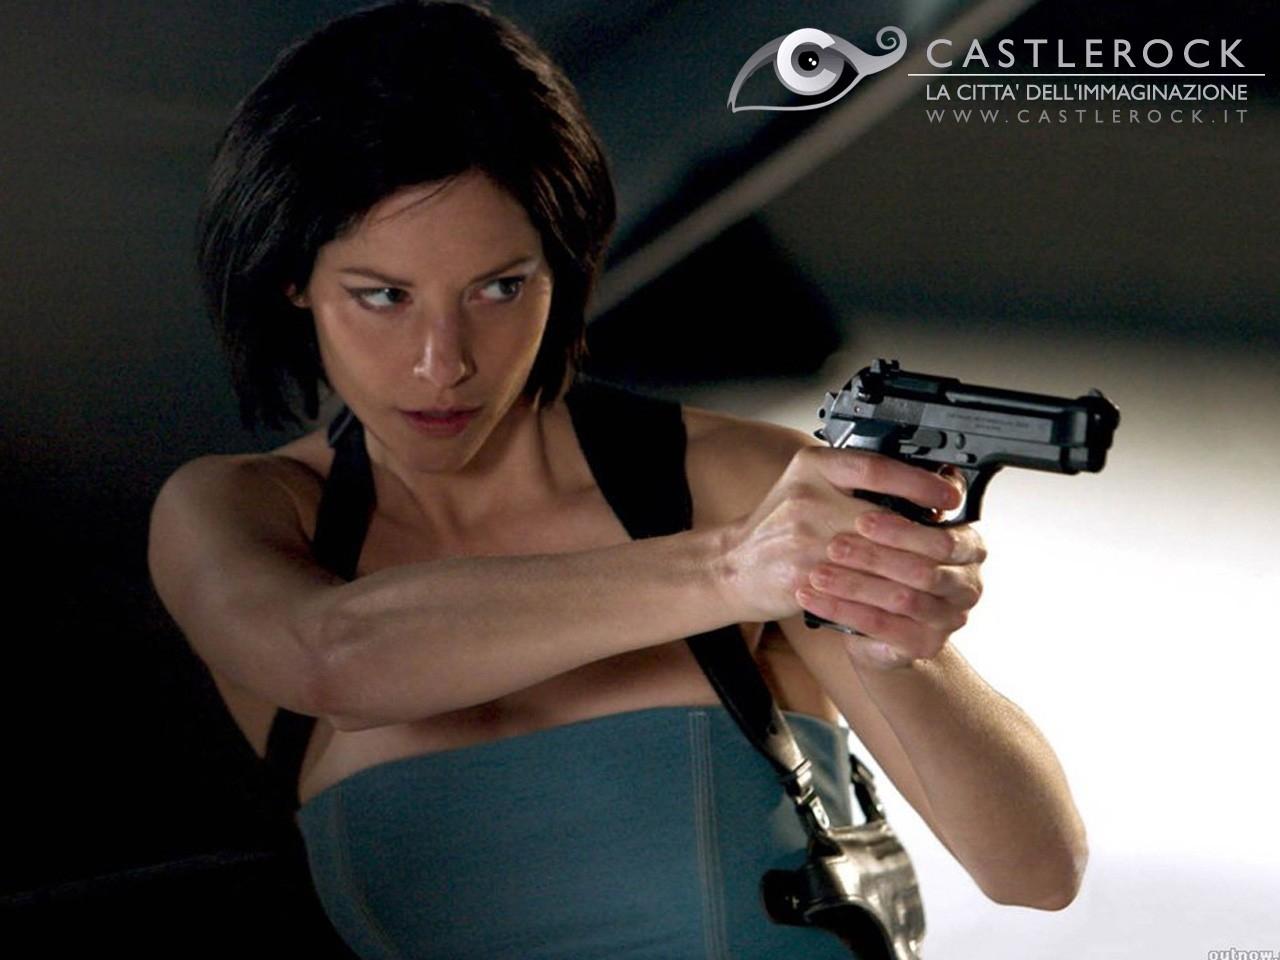 Wallpaper del film Resident Evil: Apocalypse